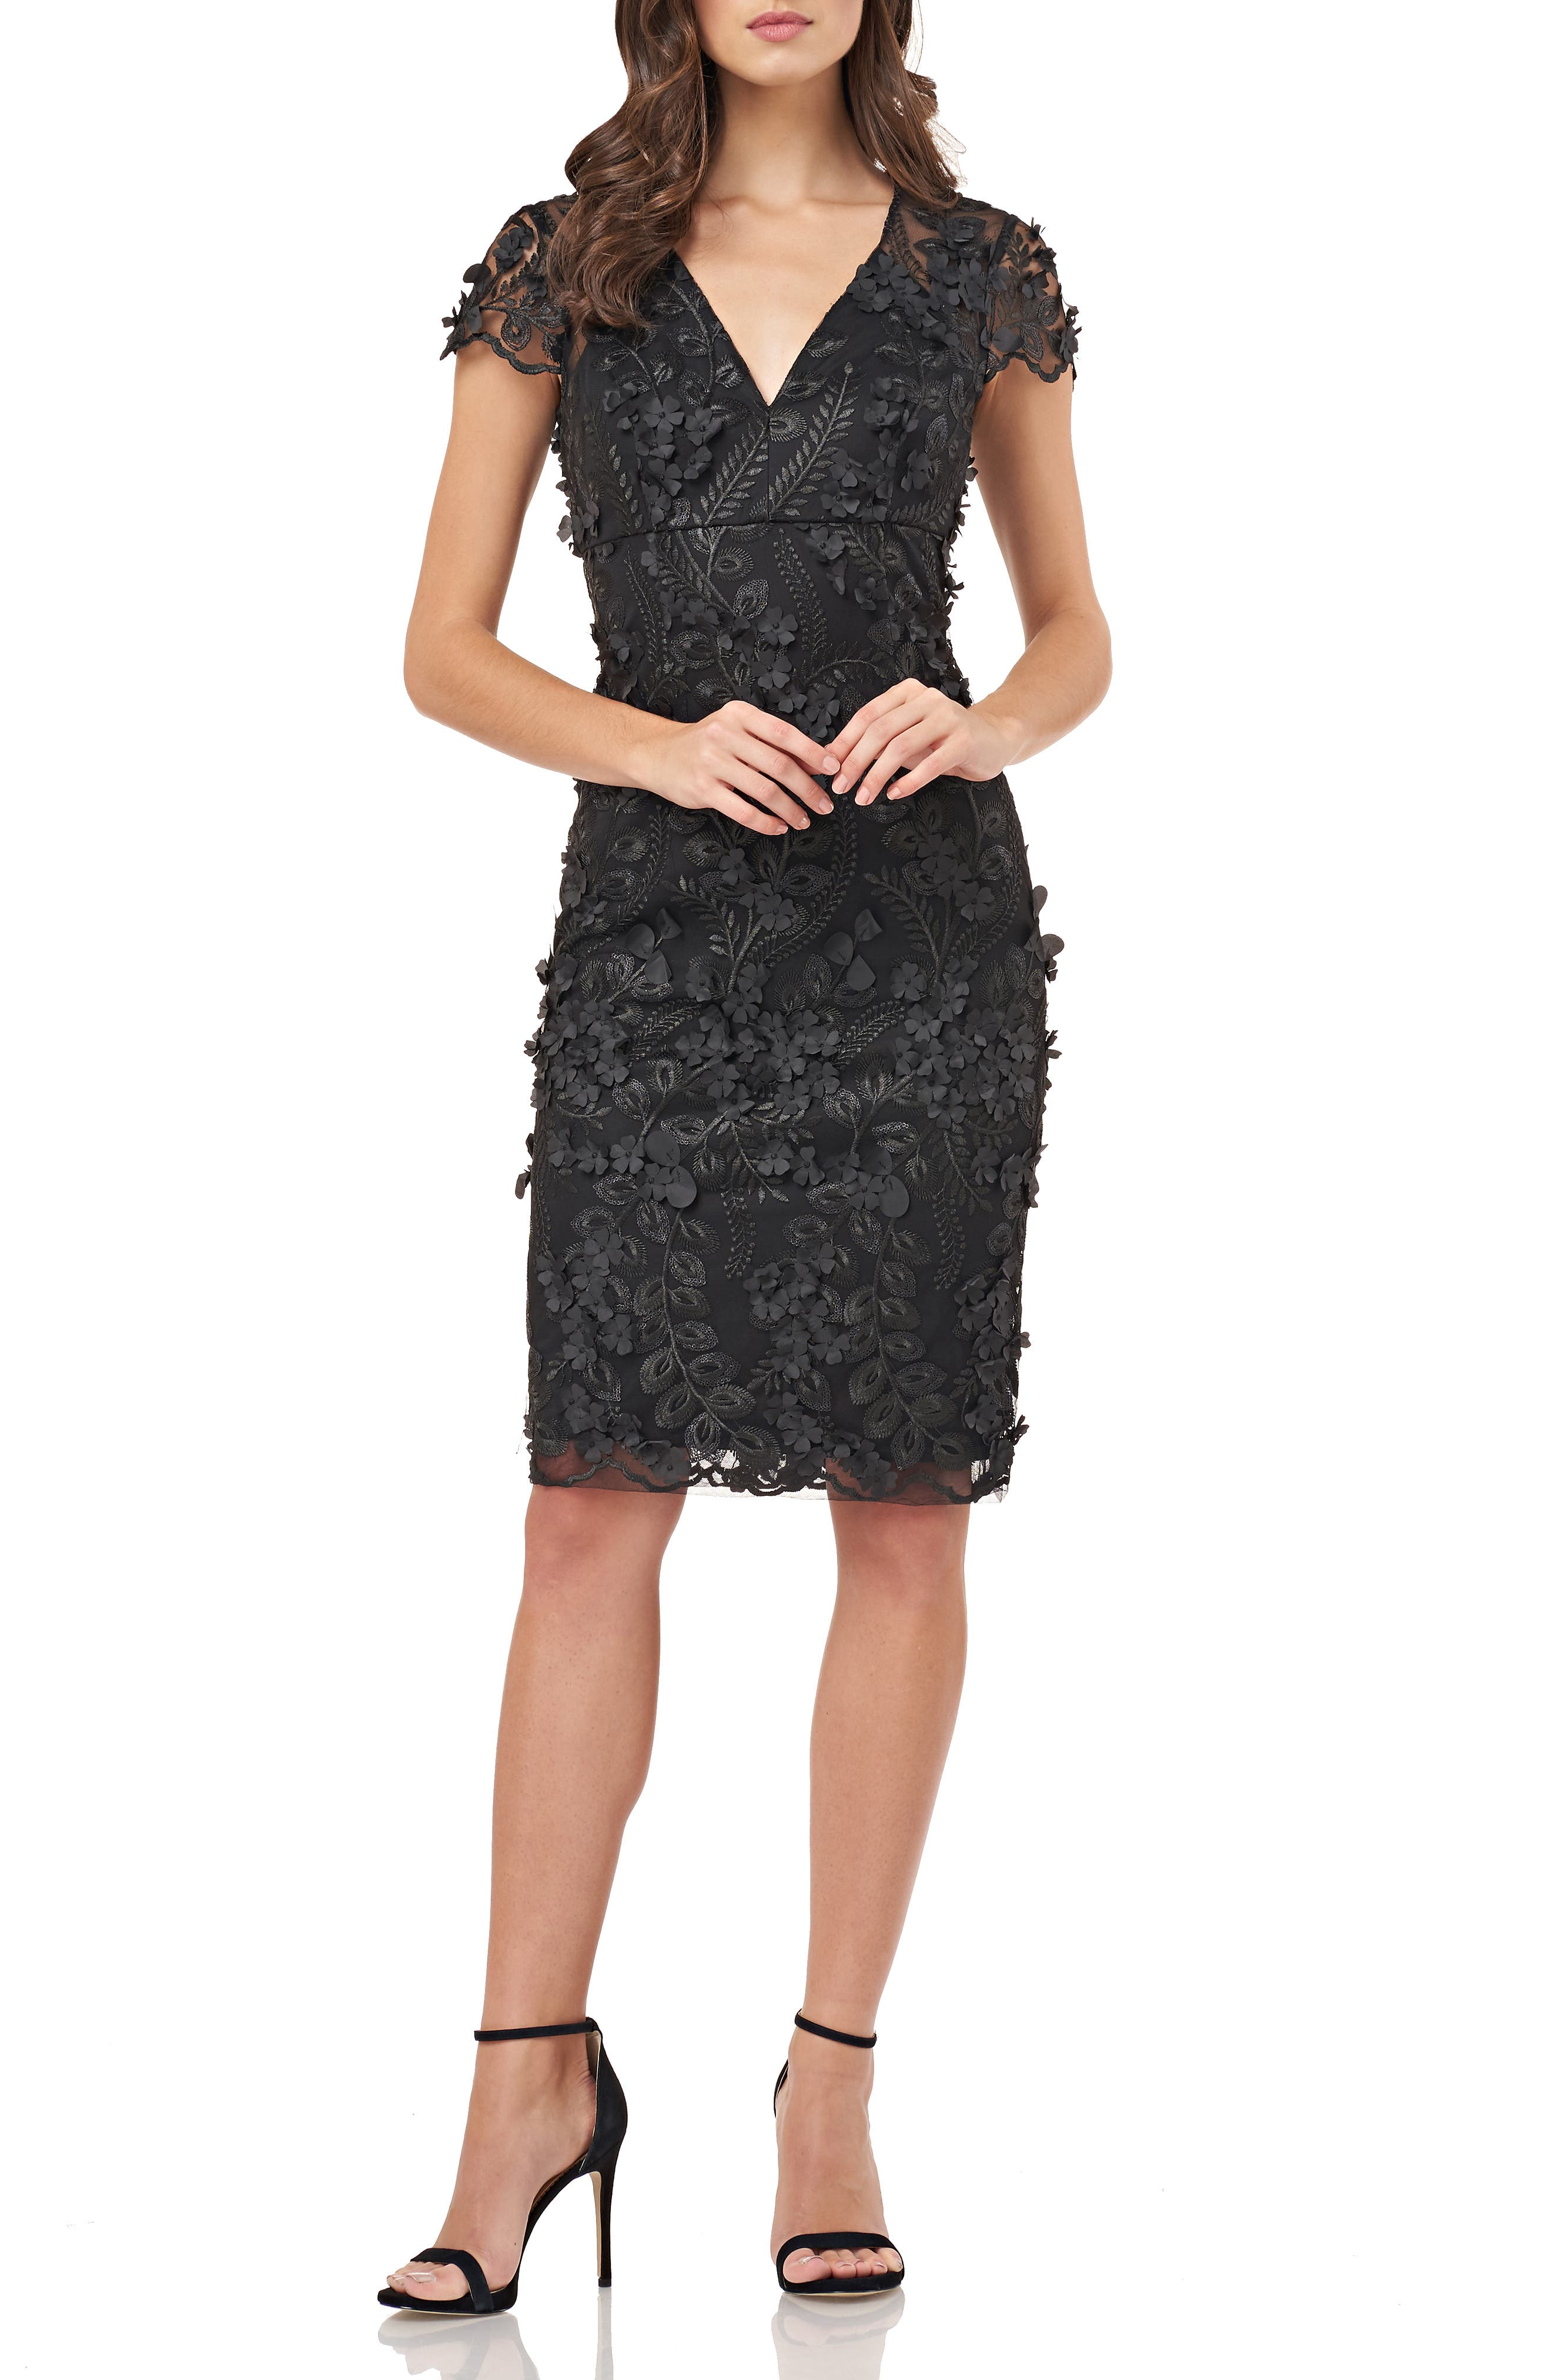 CARMEN MARC VALVO INFUSION Petals Embellished Cocktail Dress in Black